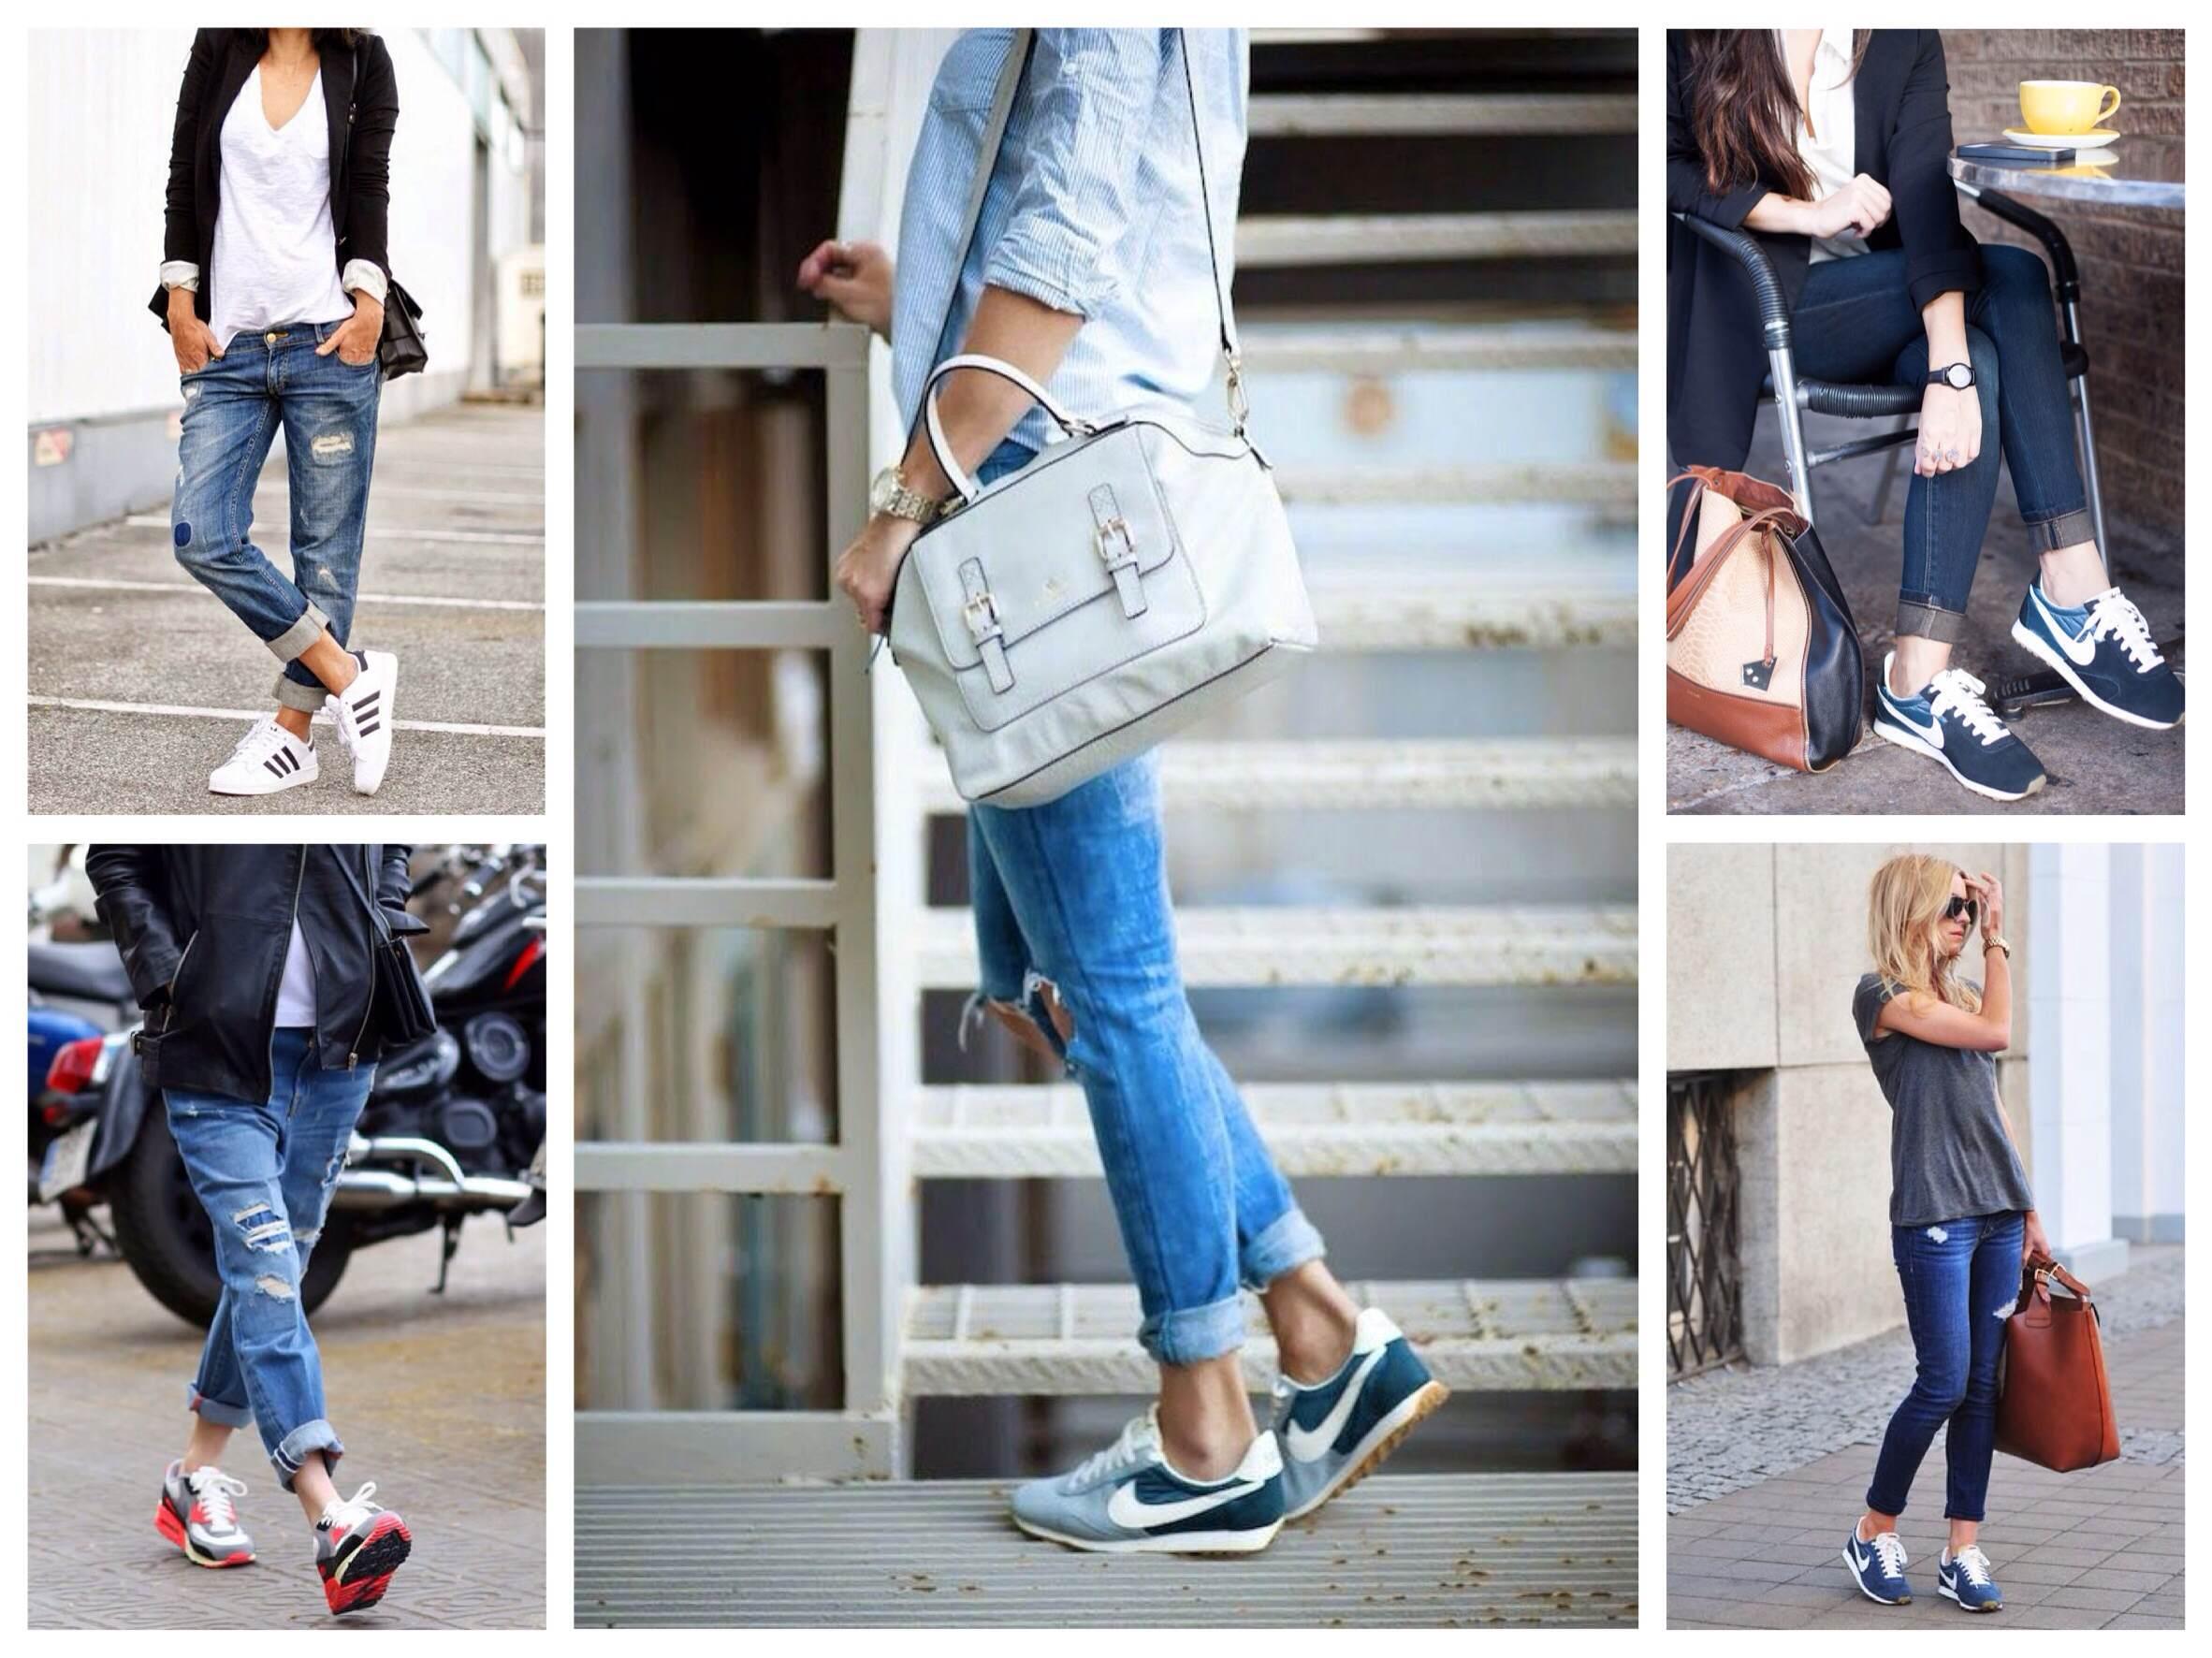 df76f835 Комбинации с различными силуэтами джинс